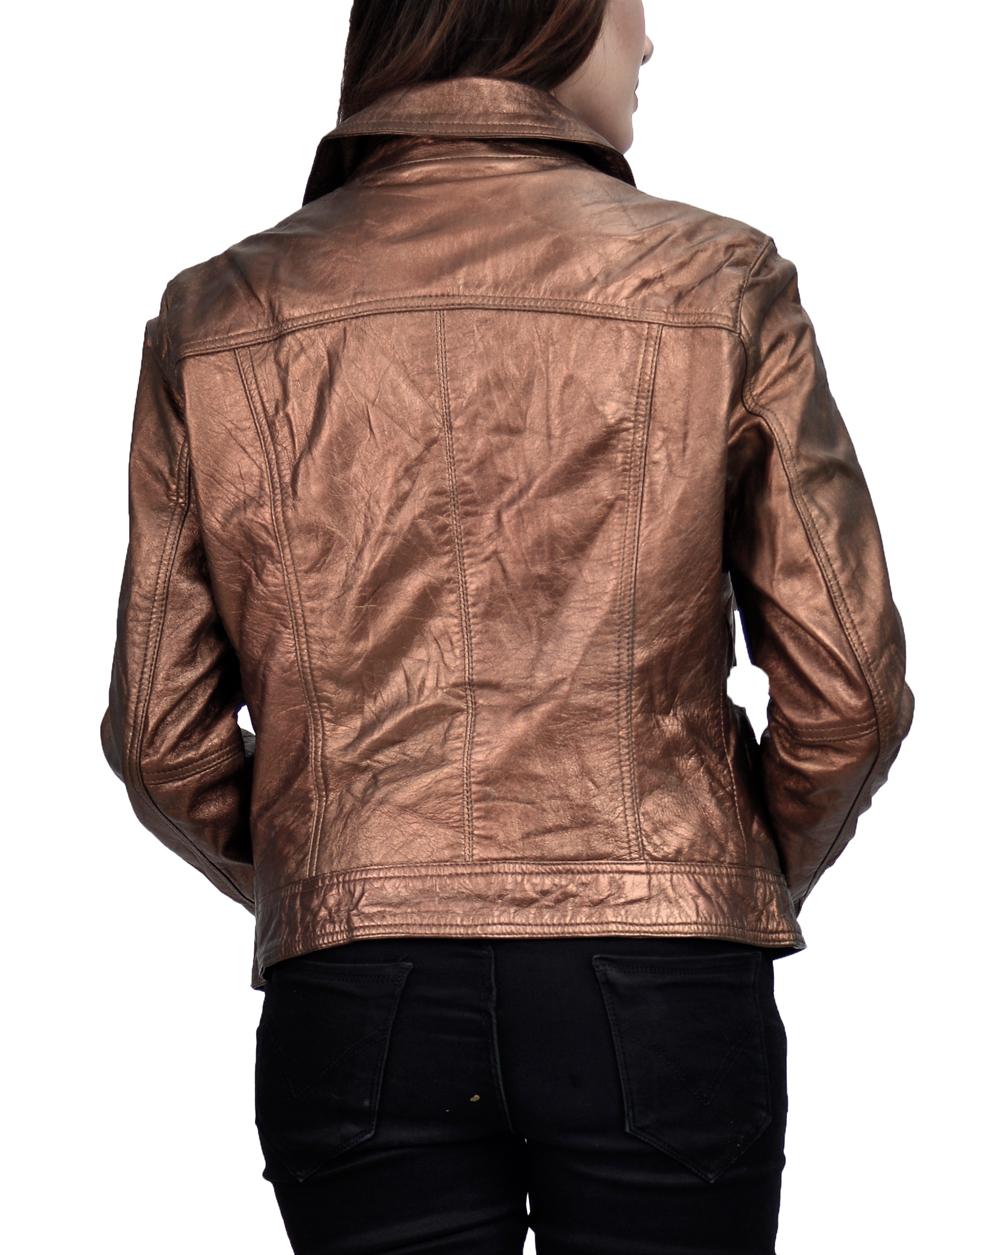 copper-metalic-jacket-b.jpg (800×1004)